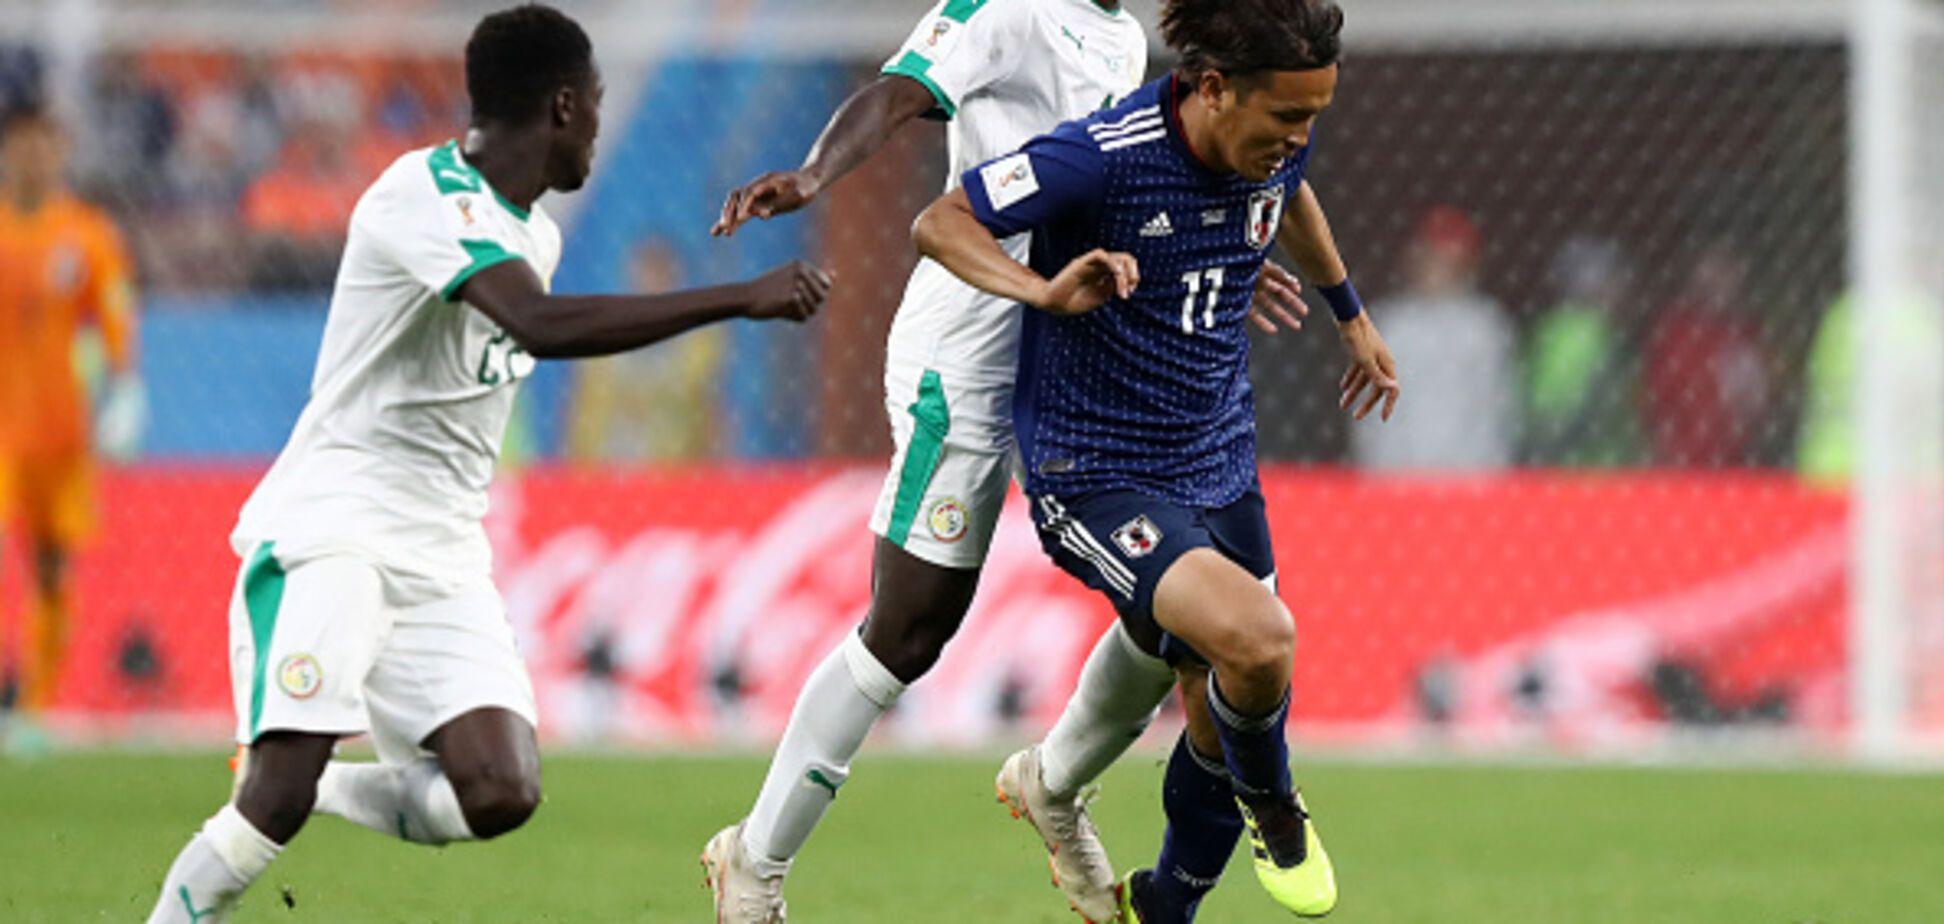 ЧС-2018: матч Японія - Польща завершився ганьбою